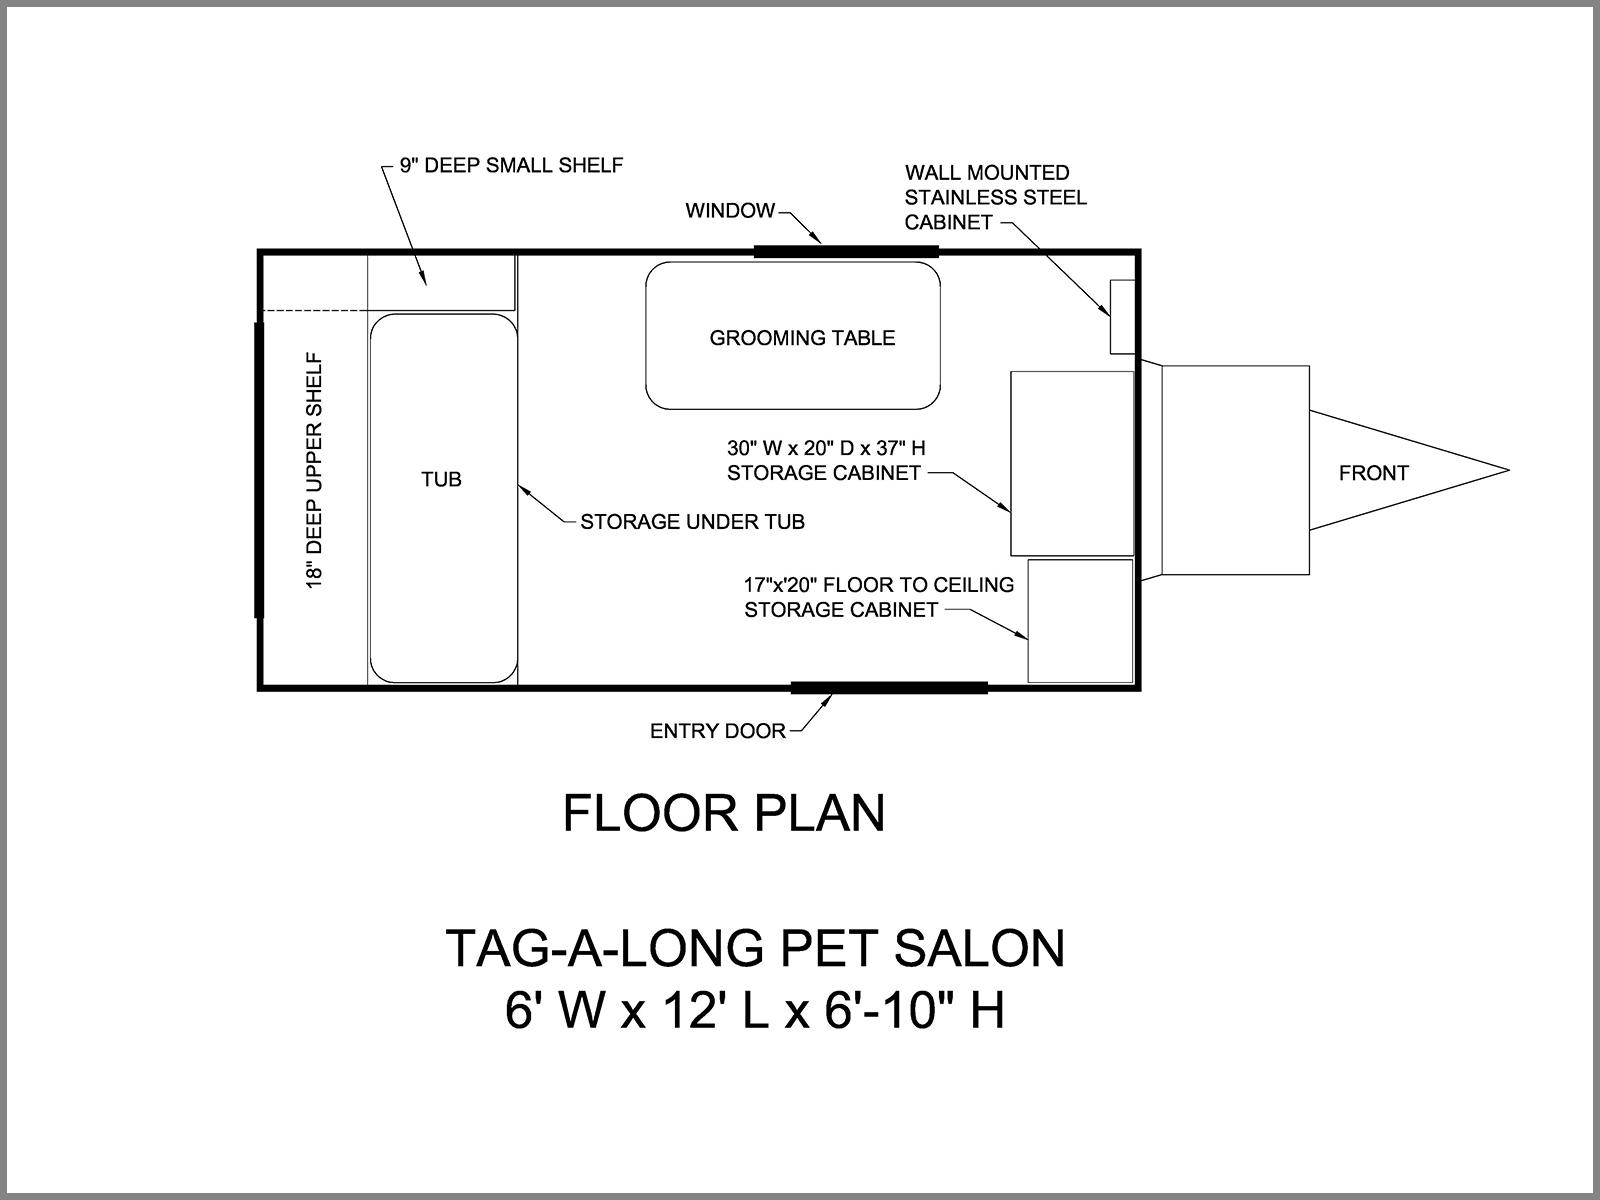 Dog Grooming Trailer Floor Plan Floor Plans How To Plan Flooring